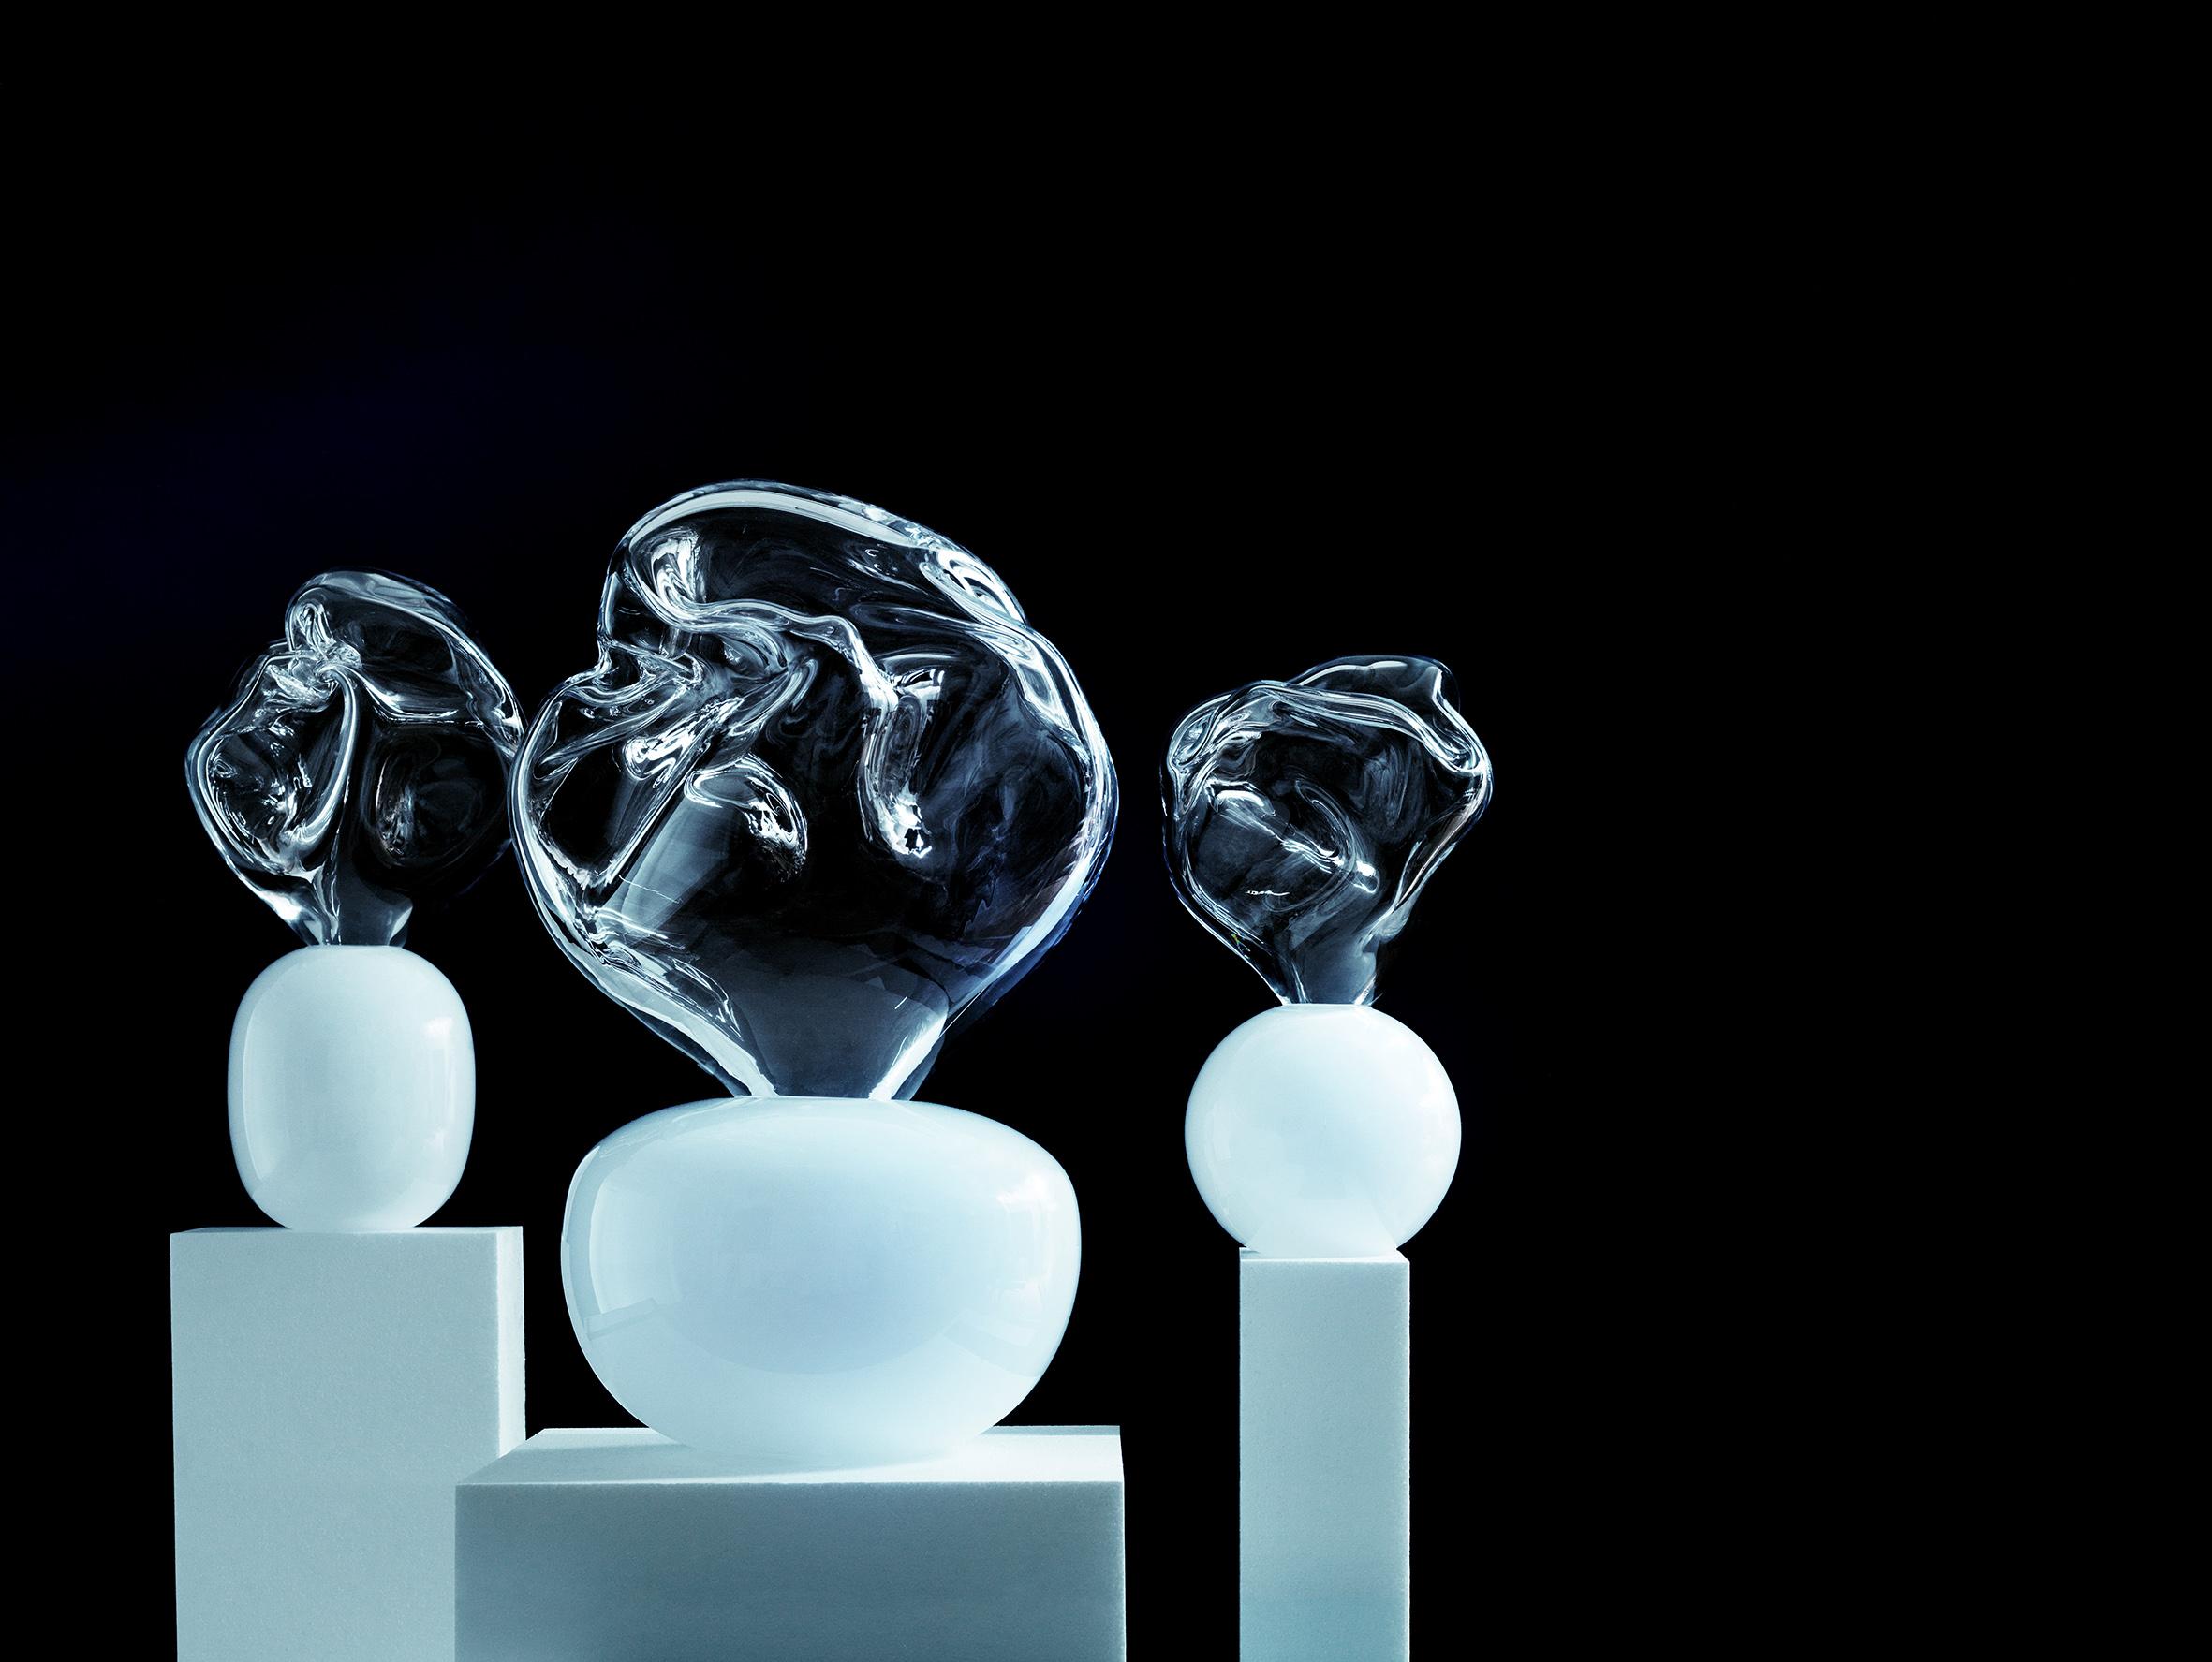 Anamorph glass StaffanHolm 100 foto@ddrgbgMagnusJohansson.jpg.jpg